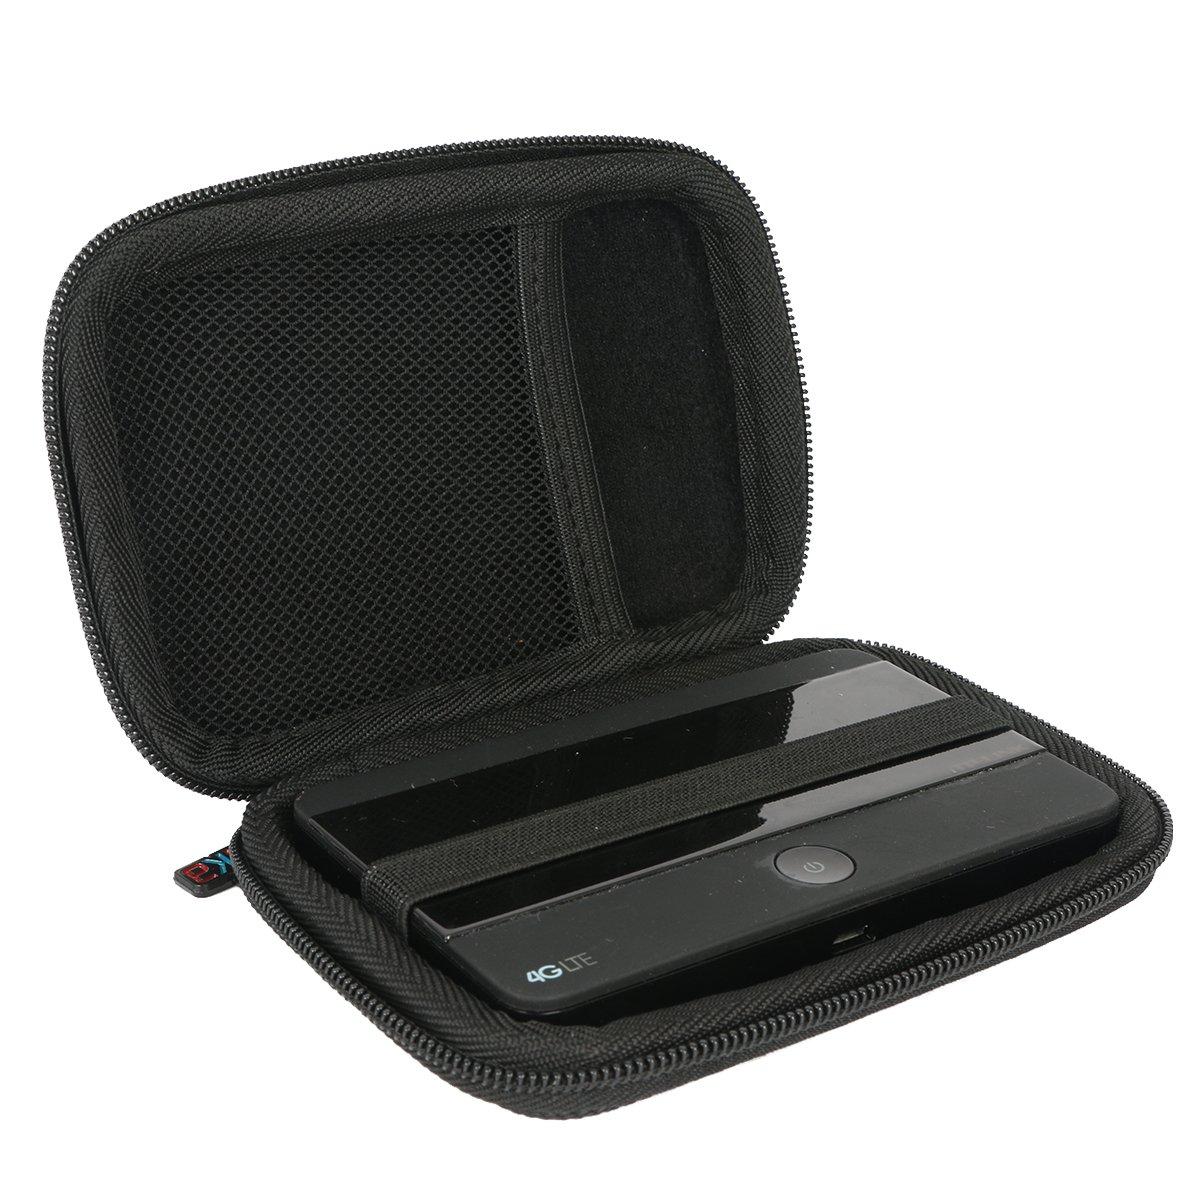 for Braun MGK3060 BT3040 BT3020 Multi Grooming Kit, Beard and Hair Trimmer Hard Case Carrying Travel Bag by Khanka